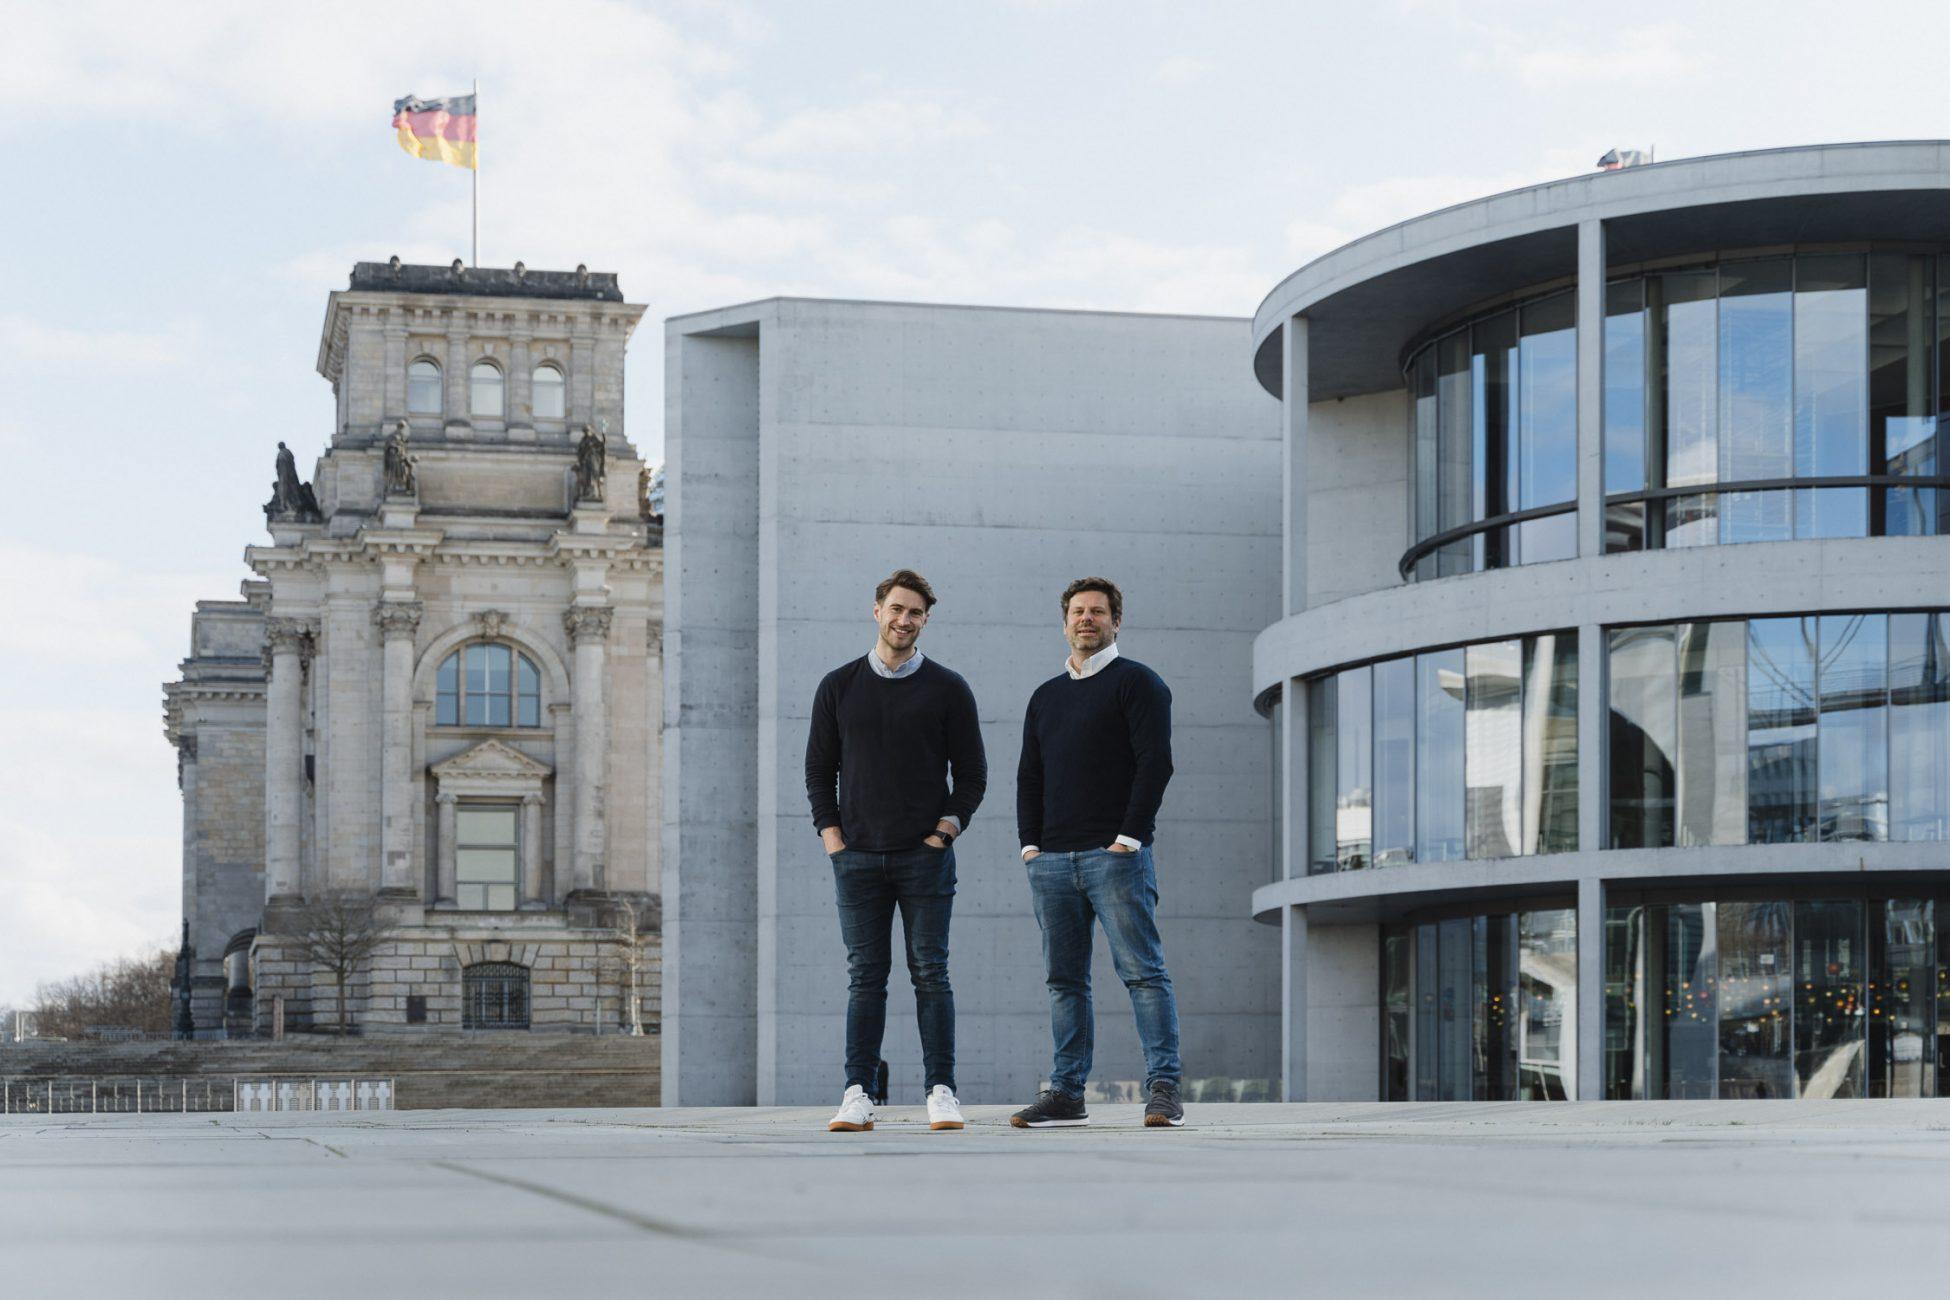 Fotoshooting David Kohlruss Regierungsviertel Paul-Löbe-Haus Berlin Portrait Bewerbungsfoto